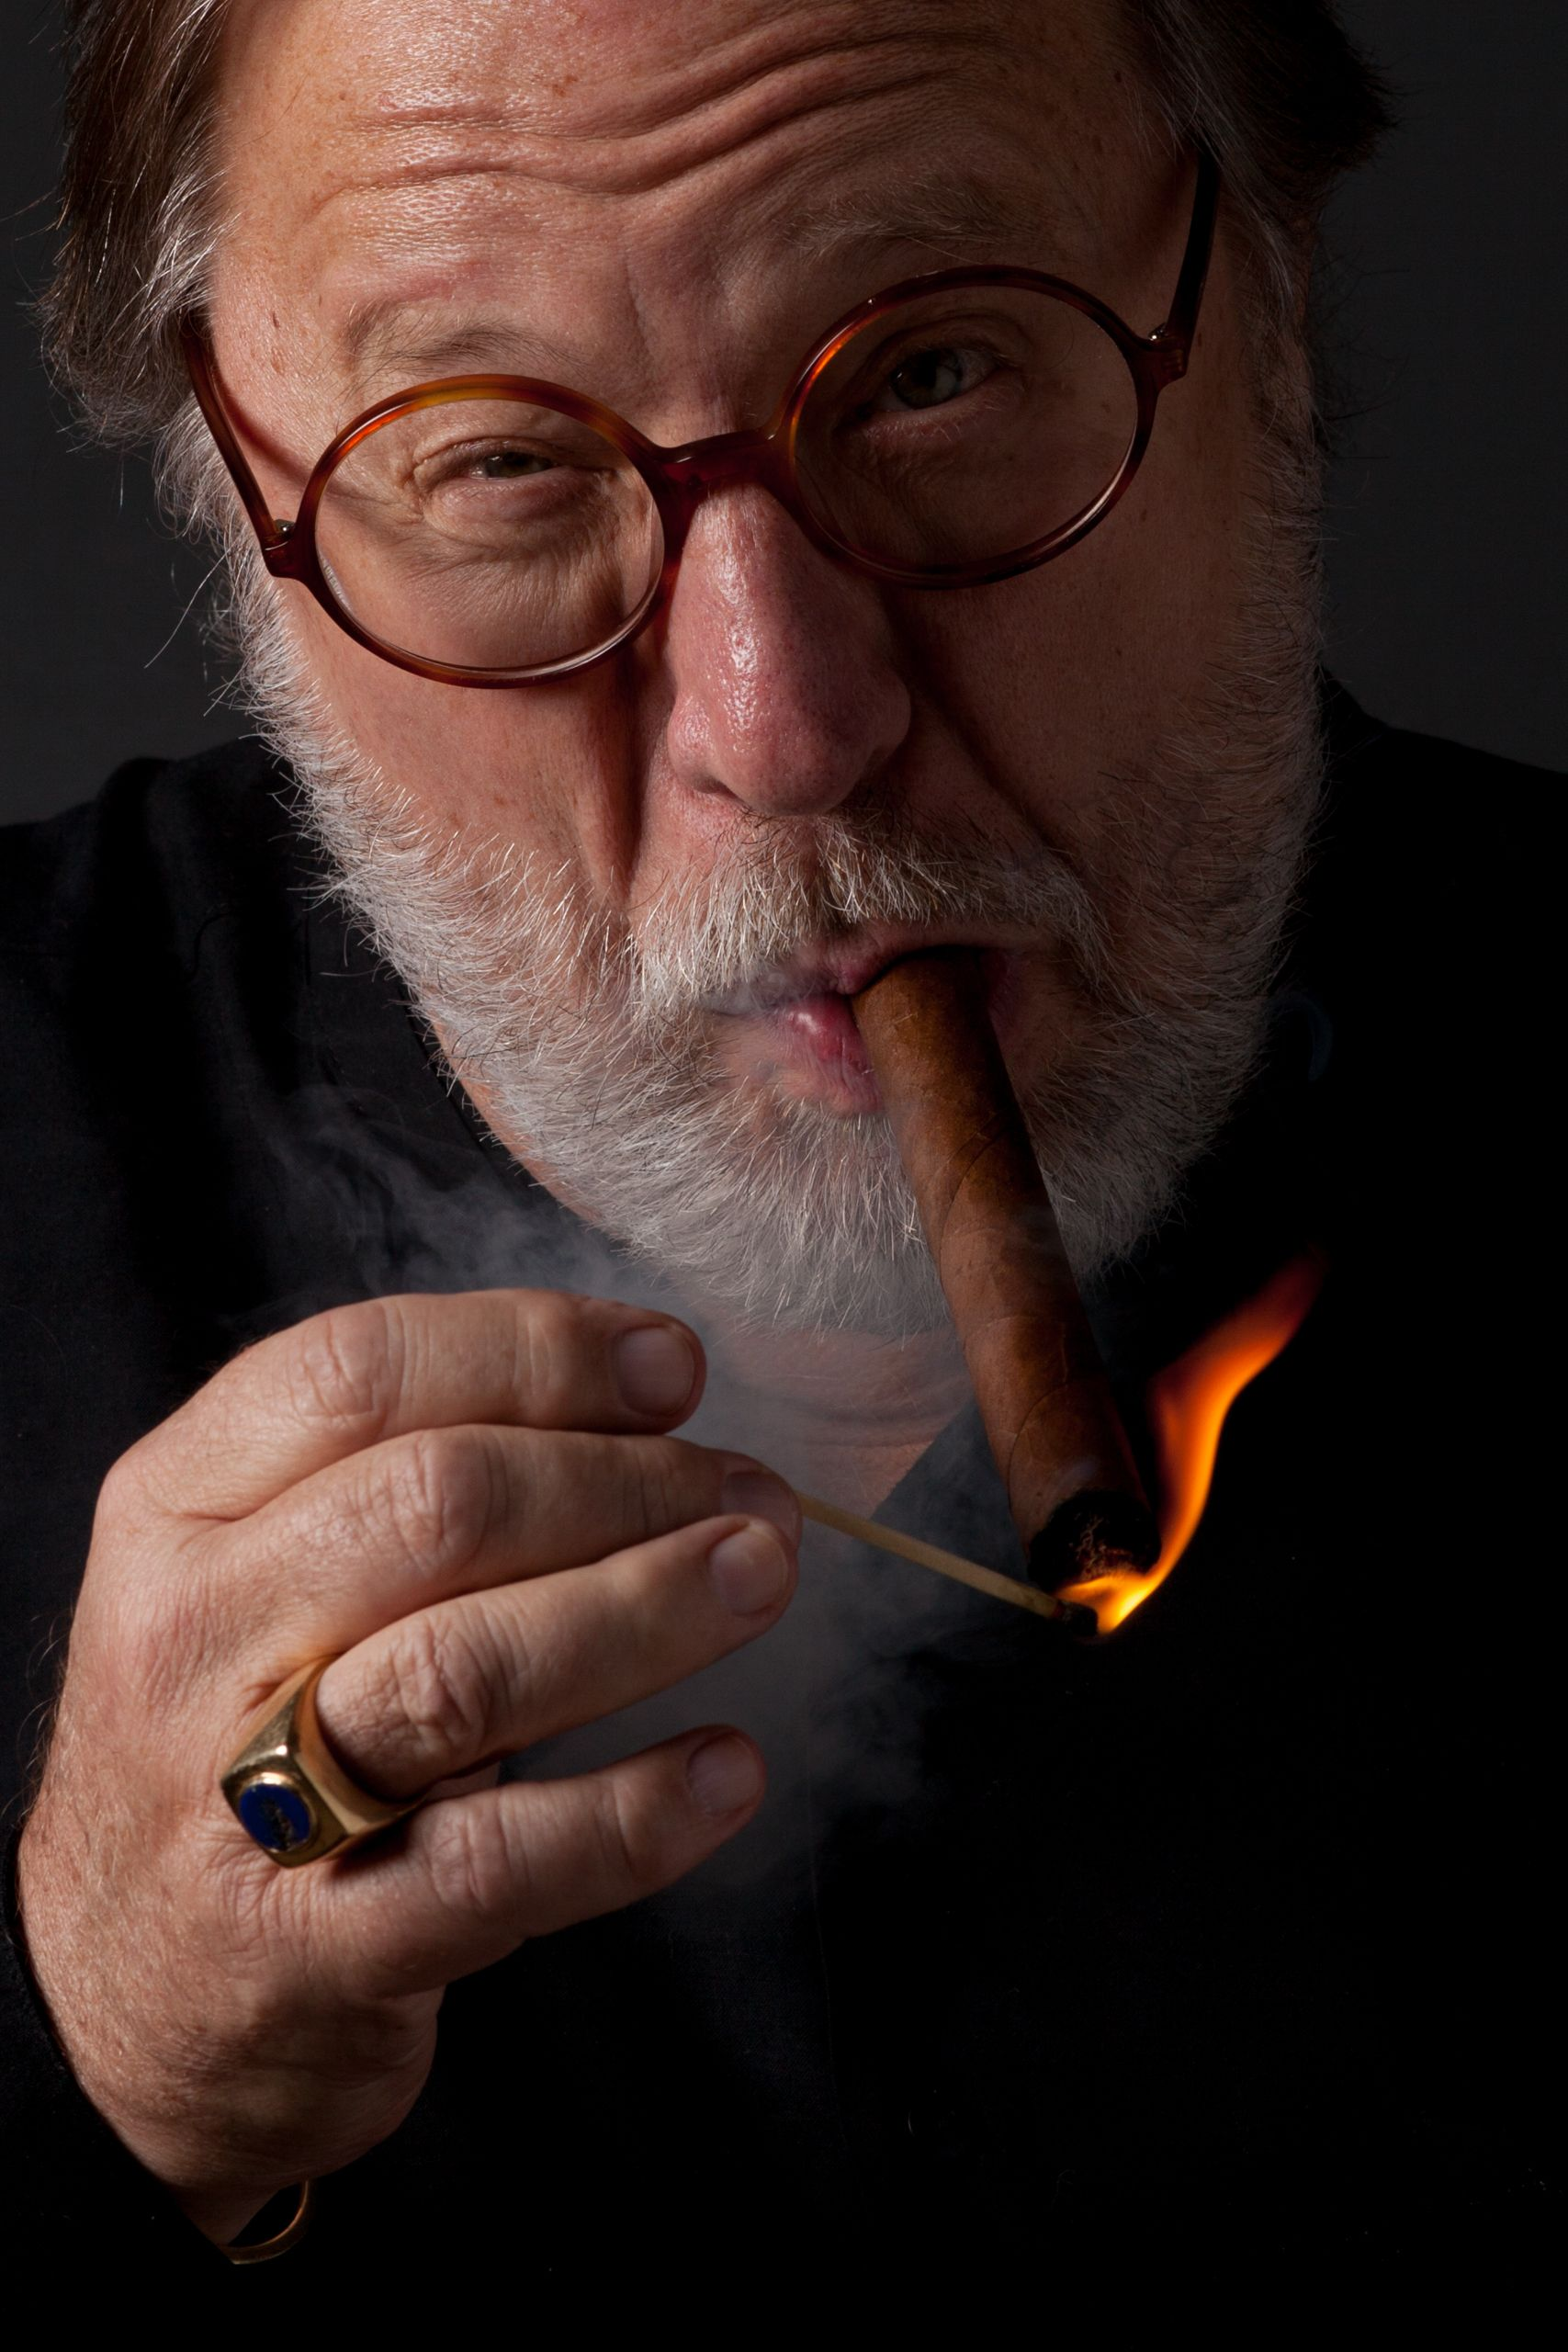 Chuck Robison lighting cigar